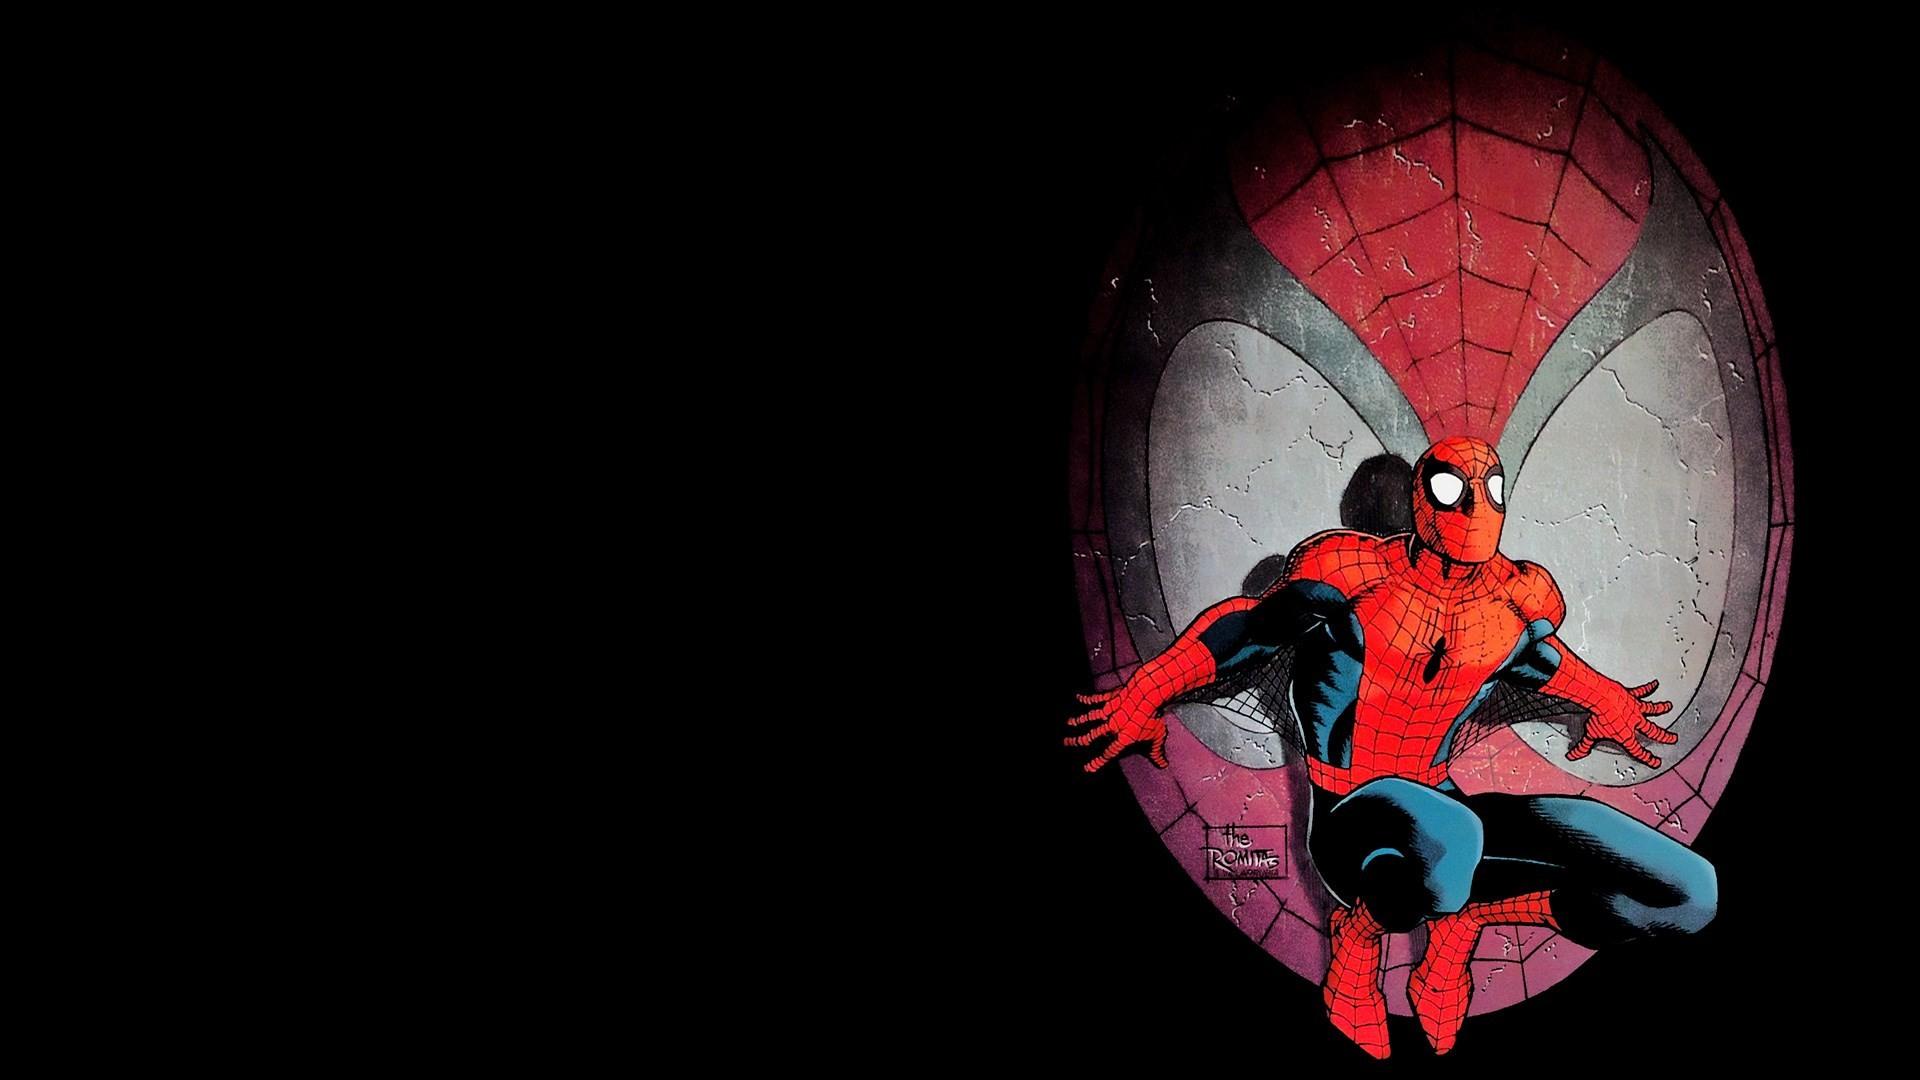 10 Best Spider Man 2099 Wallpaper Hd Full Hd 1920 1080 For: Spiderman 2018 Wallpaper (75+ Images